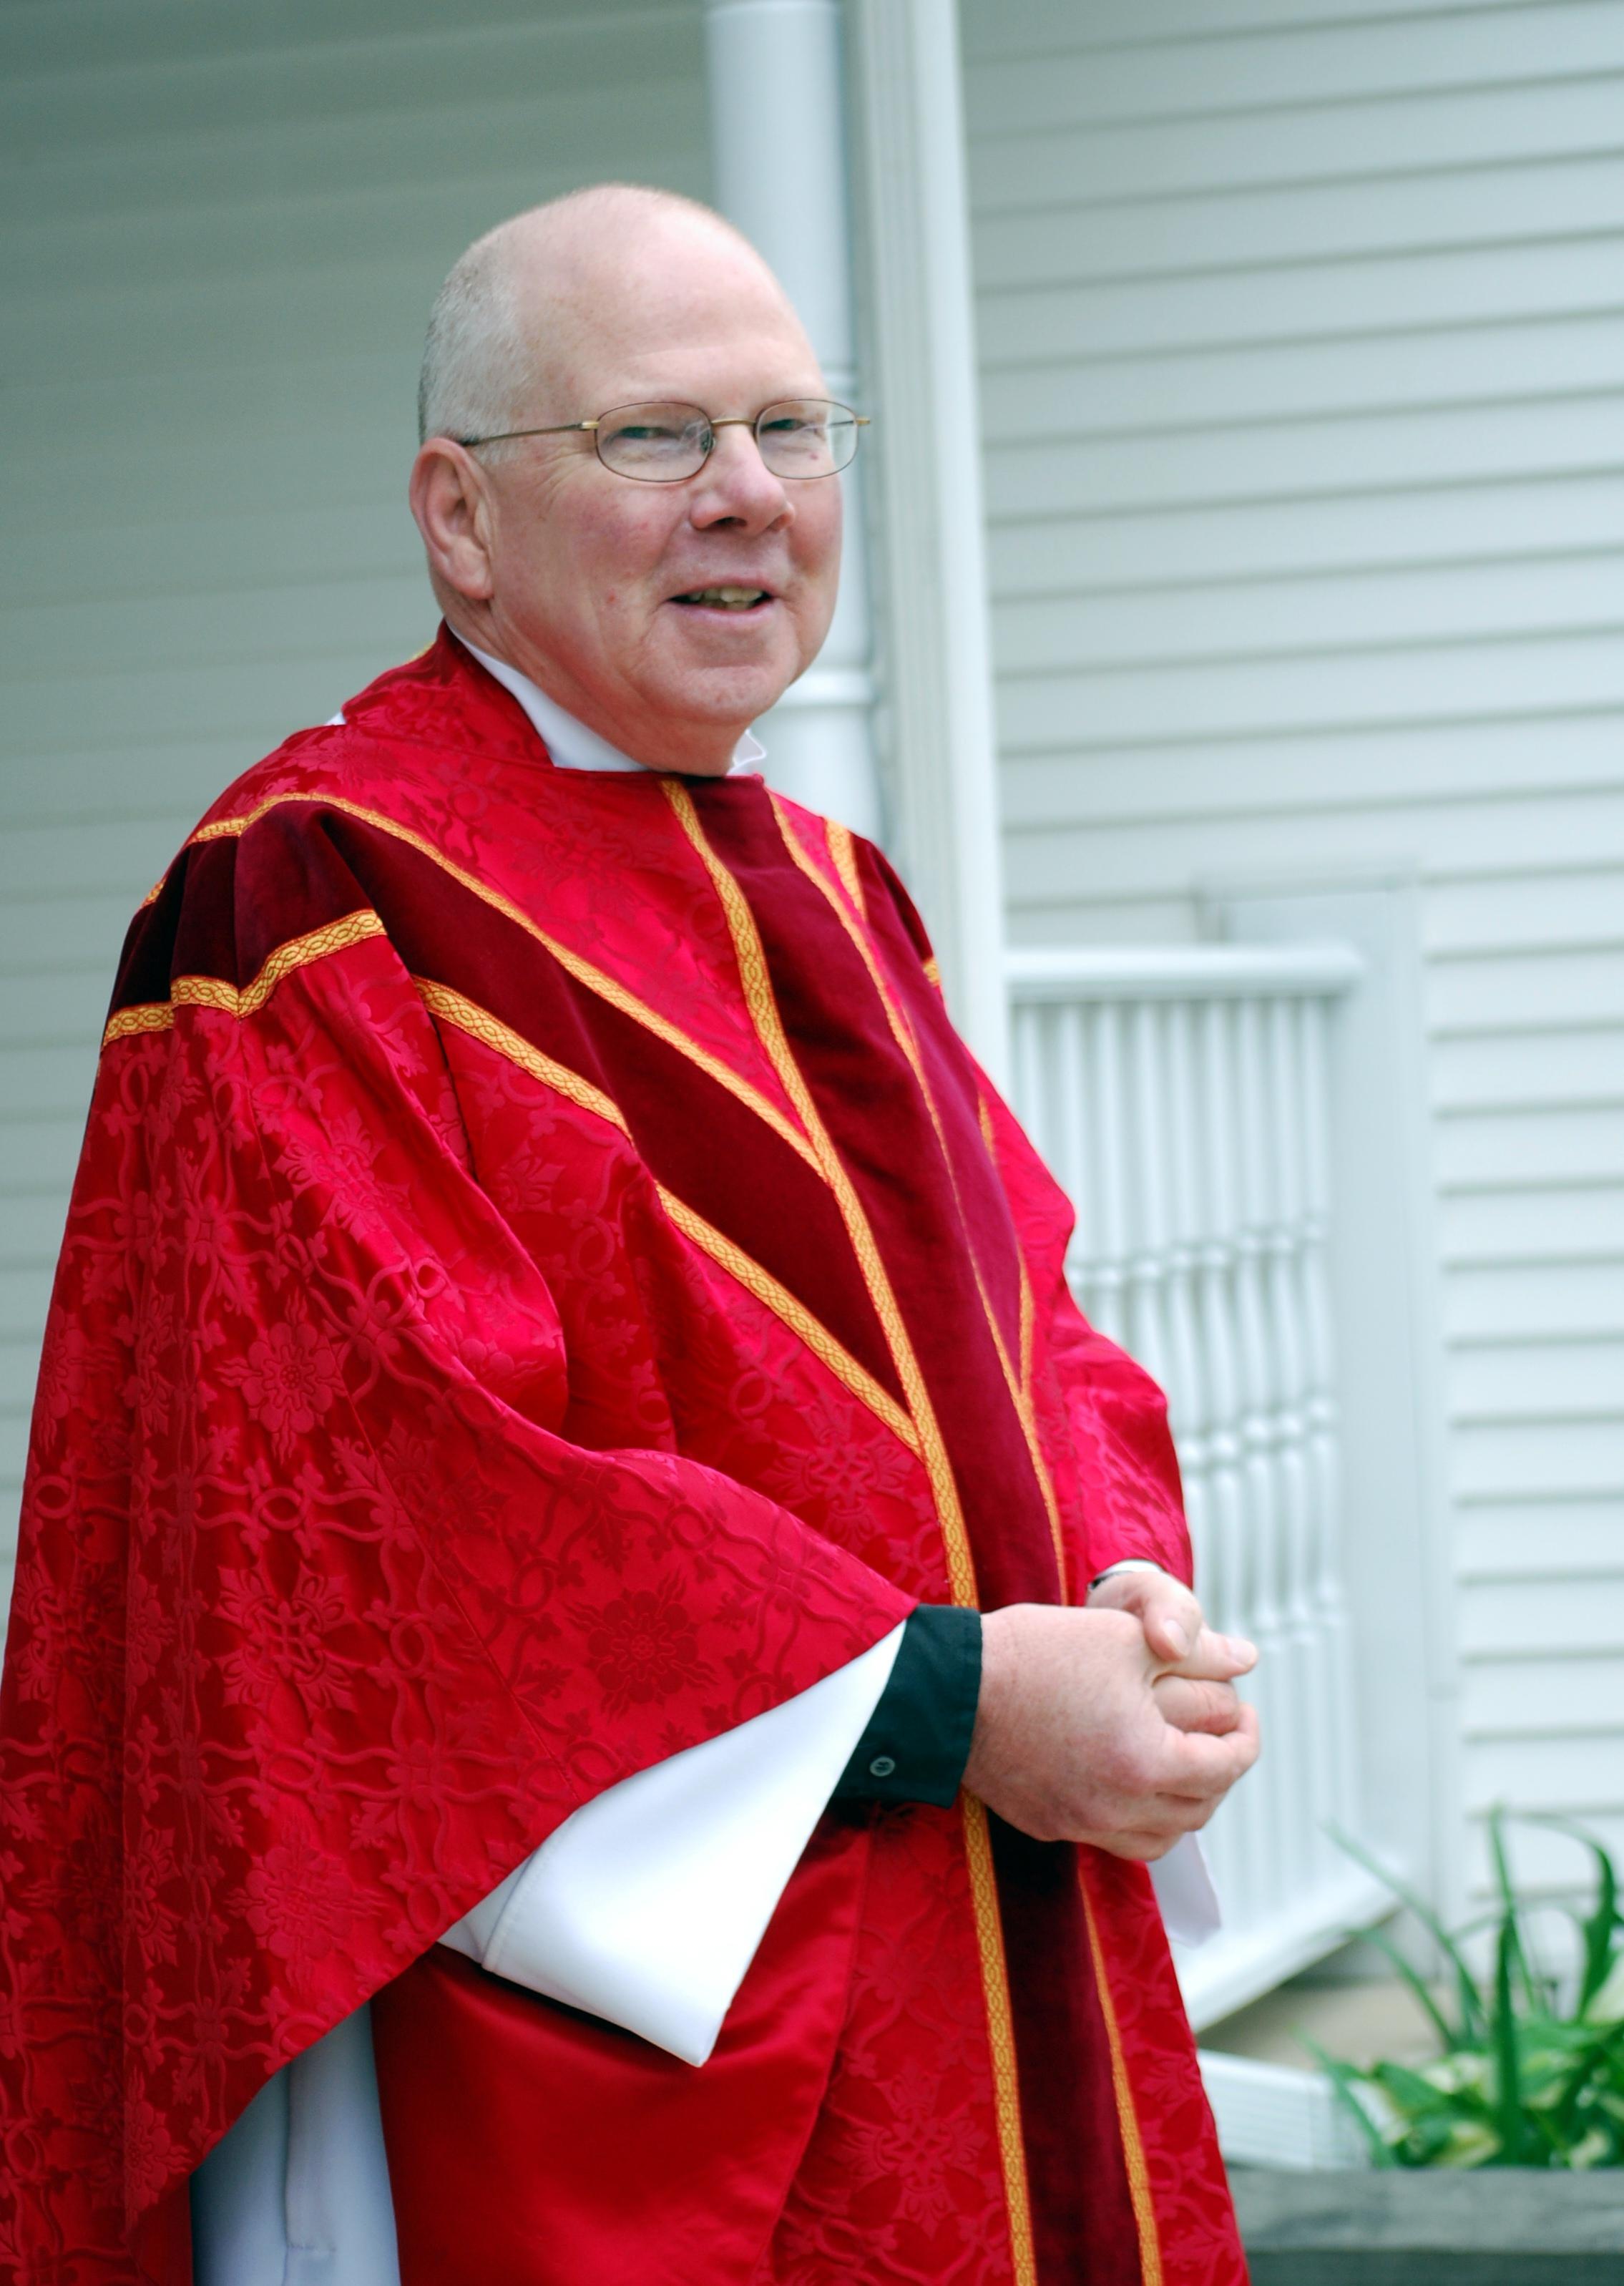 The Reverend Canon Paul C. Donecker